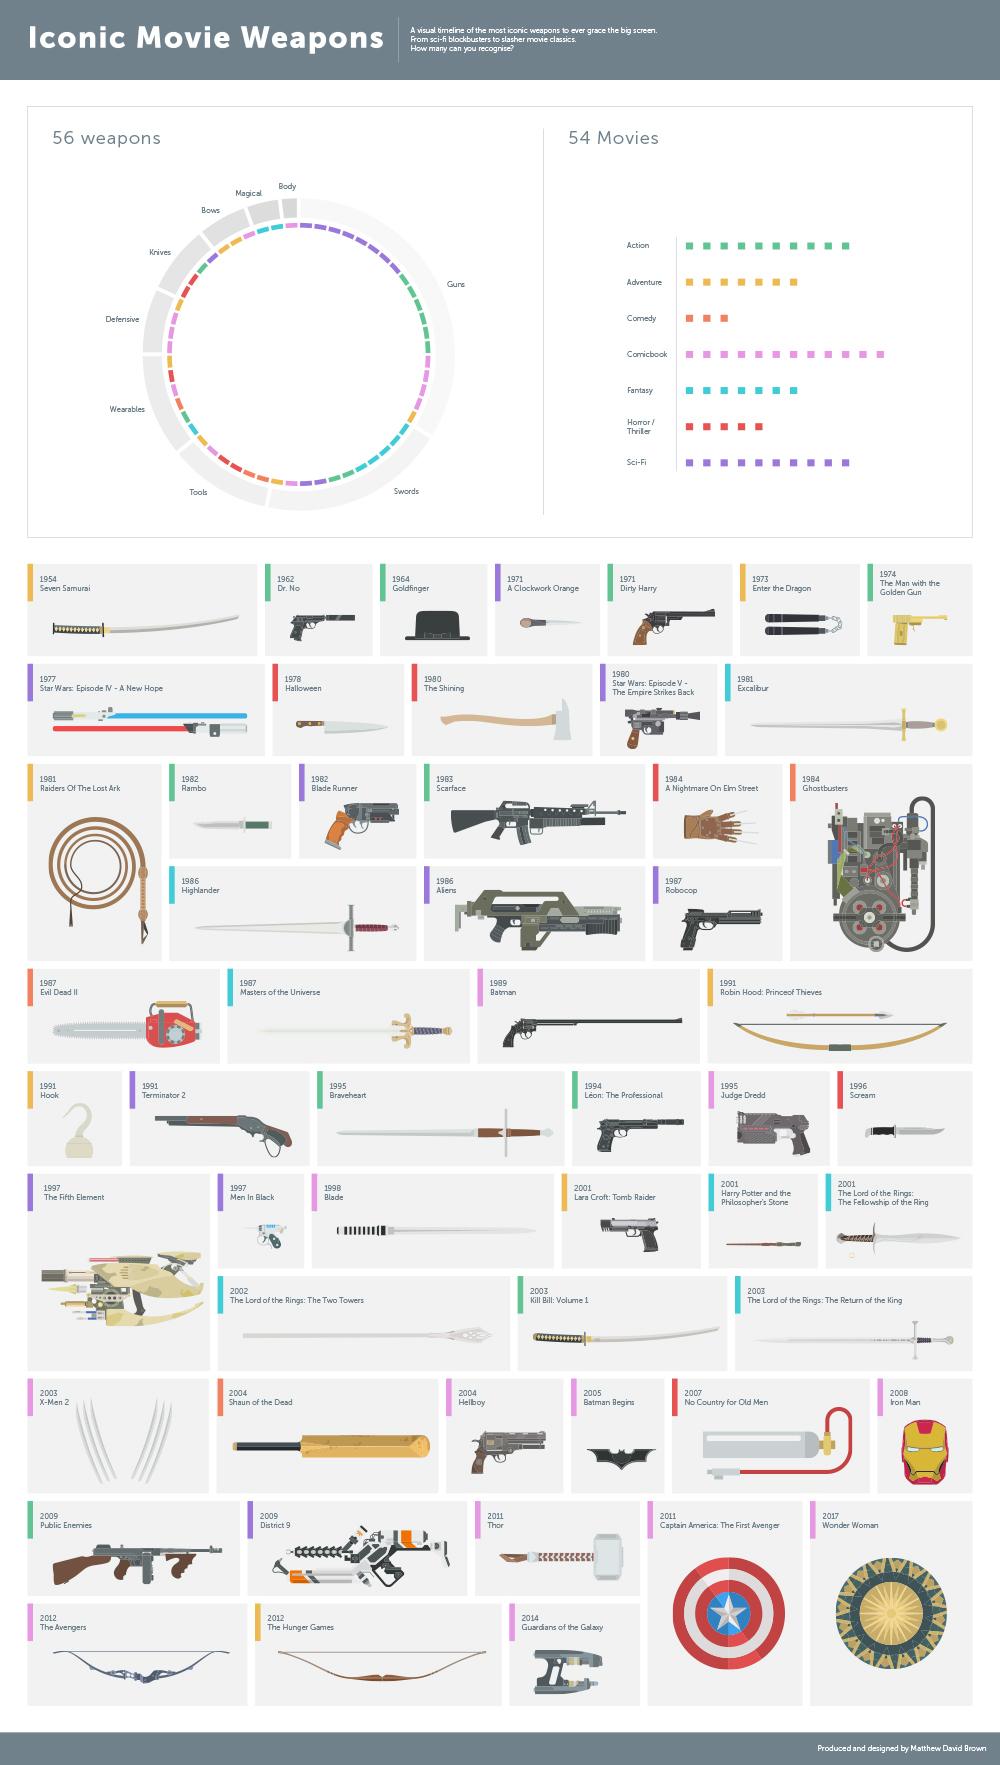 iconische film wapens